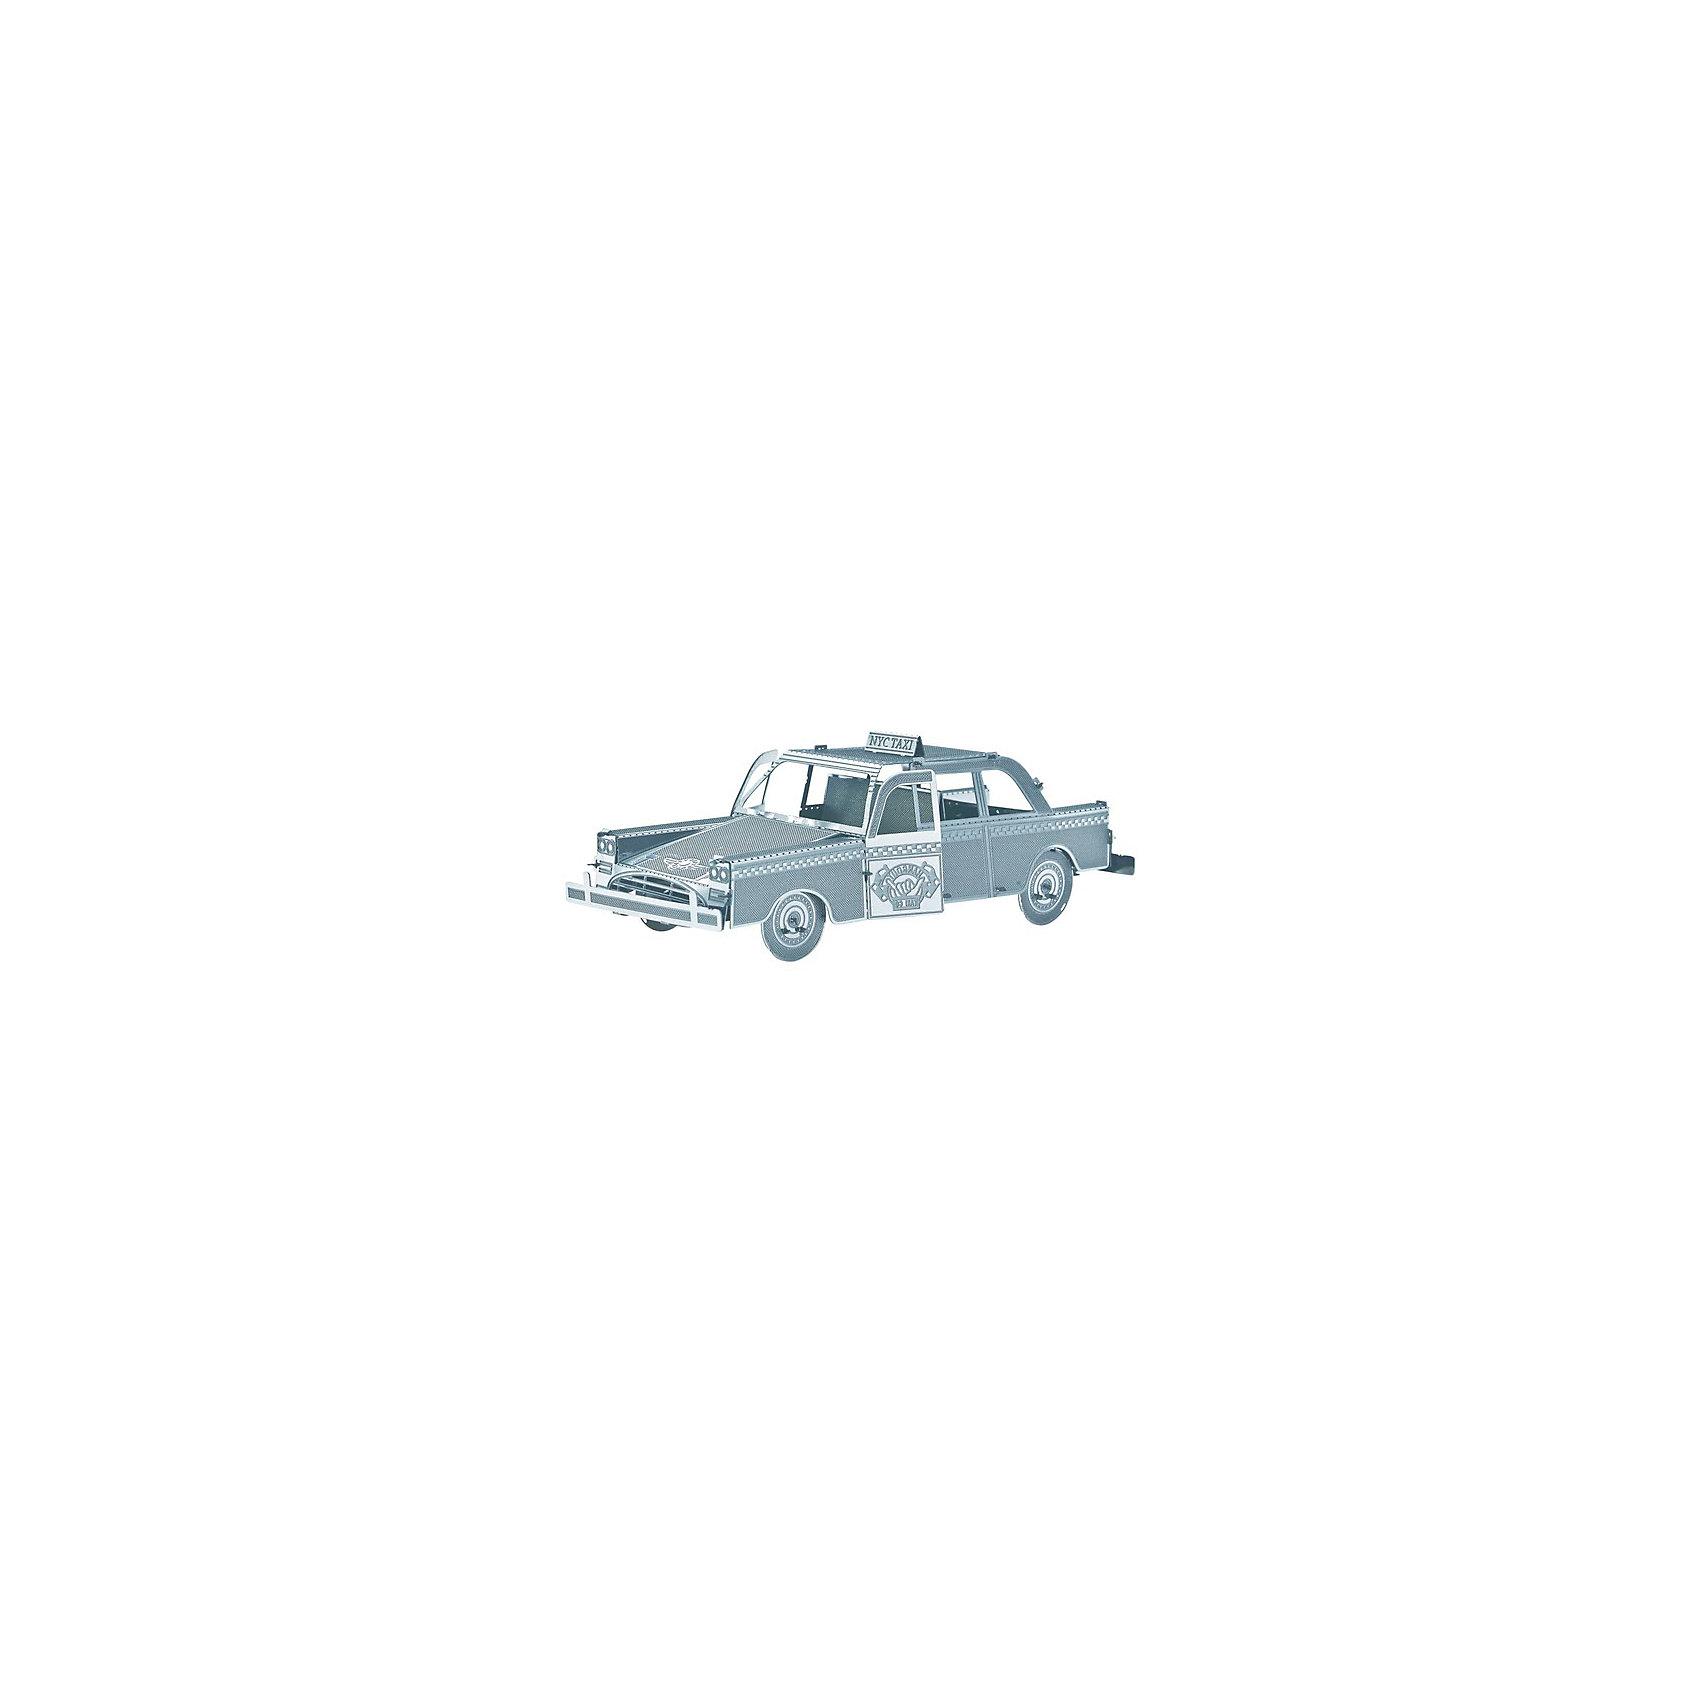 Сборная модель-3D Такси L3D пазлы<br><br><br>Ширина мм: 17<br>Глубина мм: 12<br>Высота мм: 10<br>Вес г: 29<br>Возраст от месяцев: 144<br>Возраст до месяцев: 2147483647<br>Пол: Унисекс<br>Возраст: Детский<br>SKU: 5362967